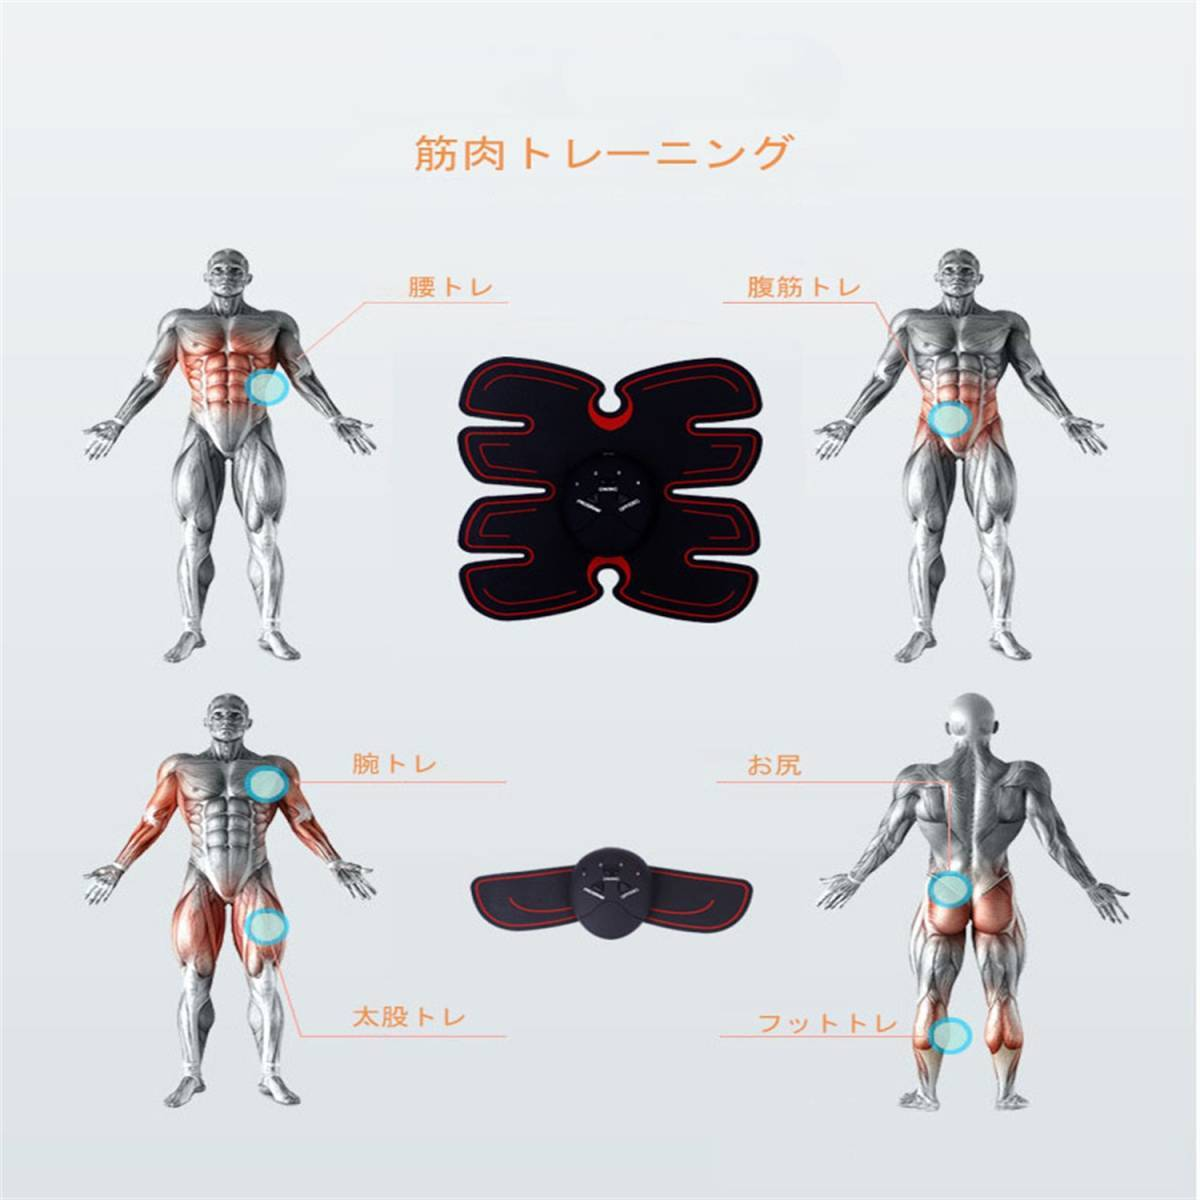 EMS 腹筋ベルト 腹筋マシーン 腹筋パッド 太もも 腕筋 筋トレ器具 ダイエット USB充電式 マッサージ エクササイズ 男女兼用 新品 _画像3